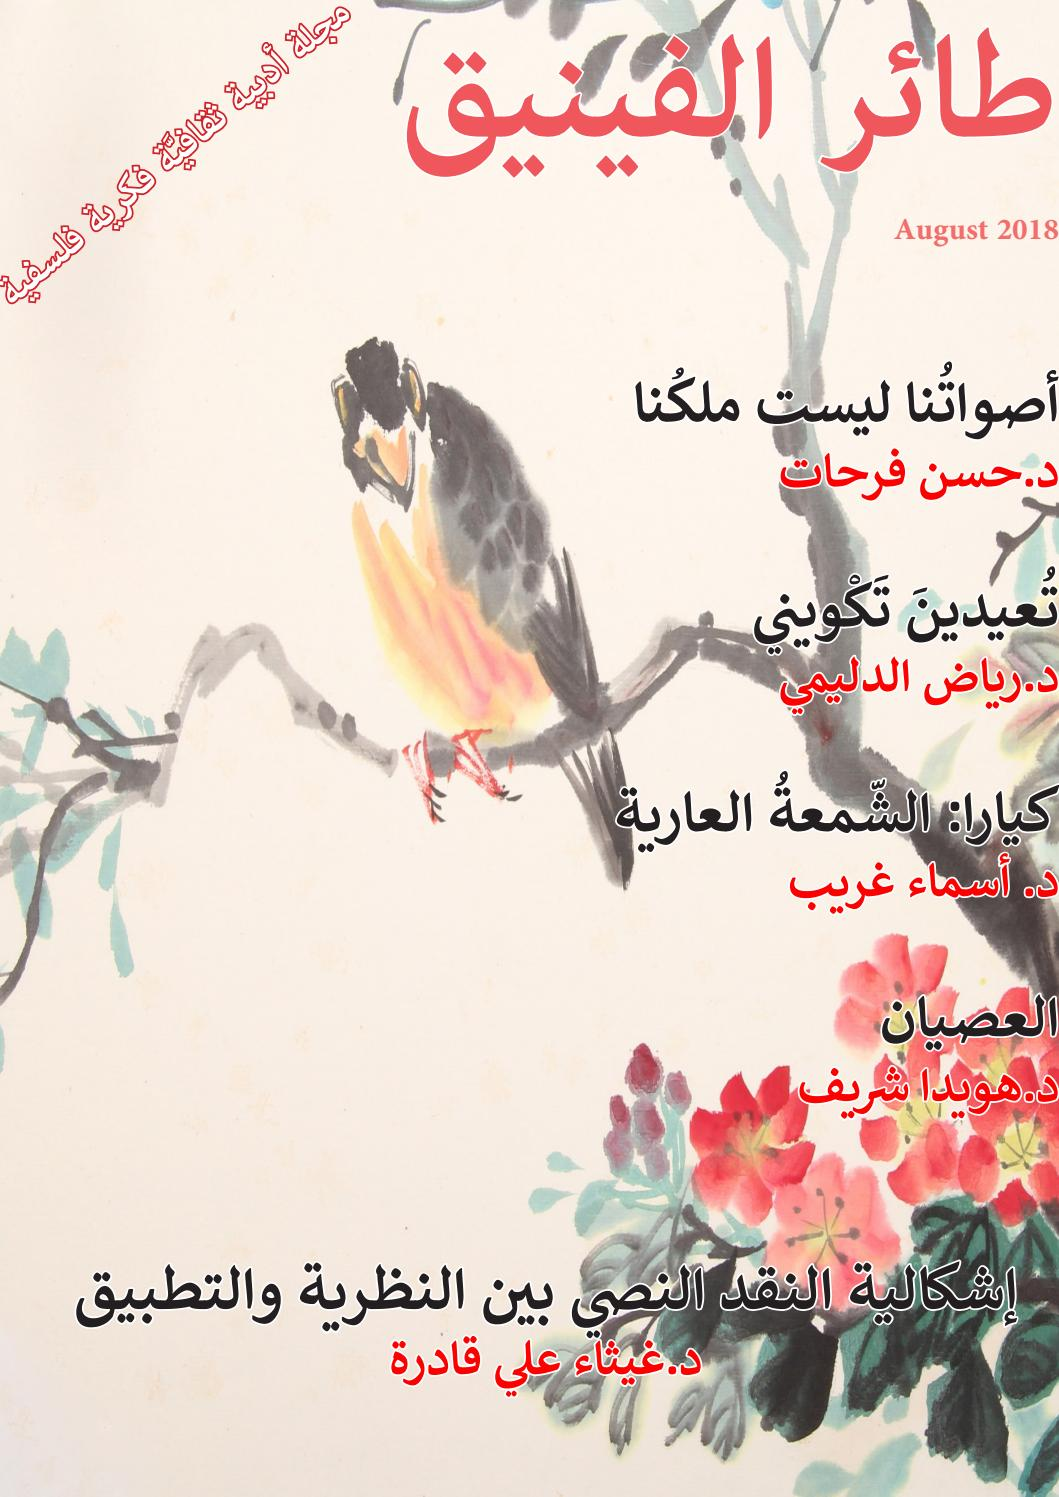 c84fd8d08 August Phoenician Bird by Welcome to Ya 7elween! - issuu